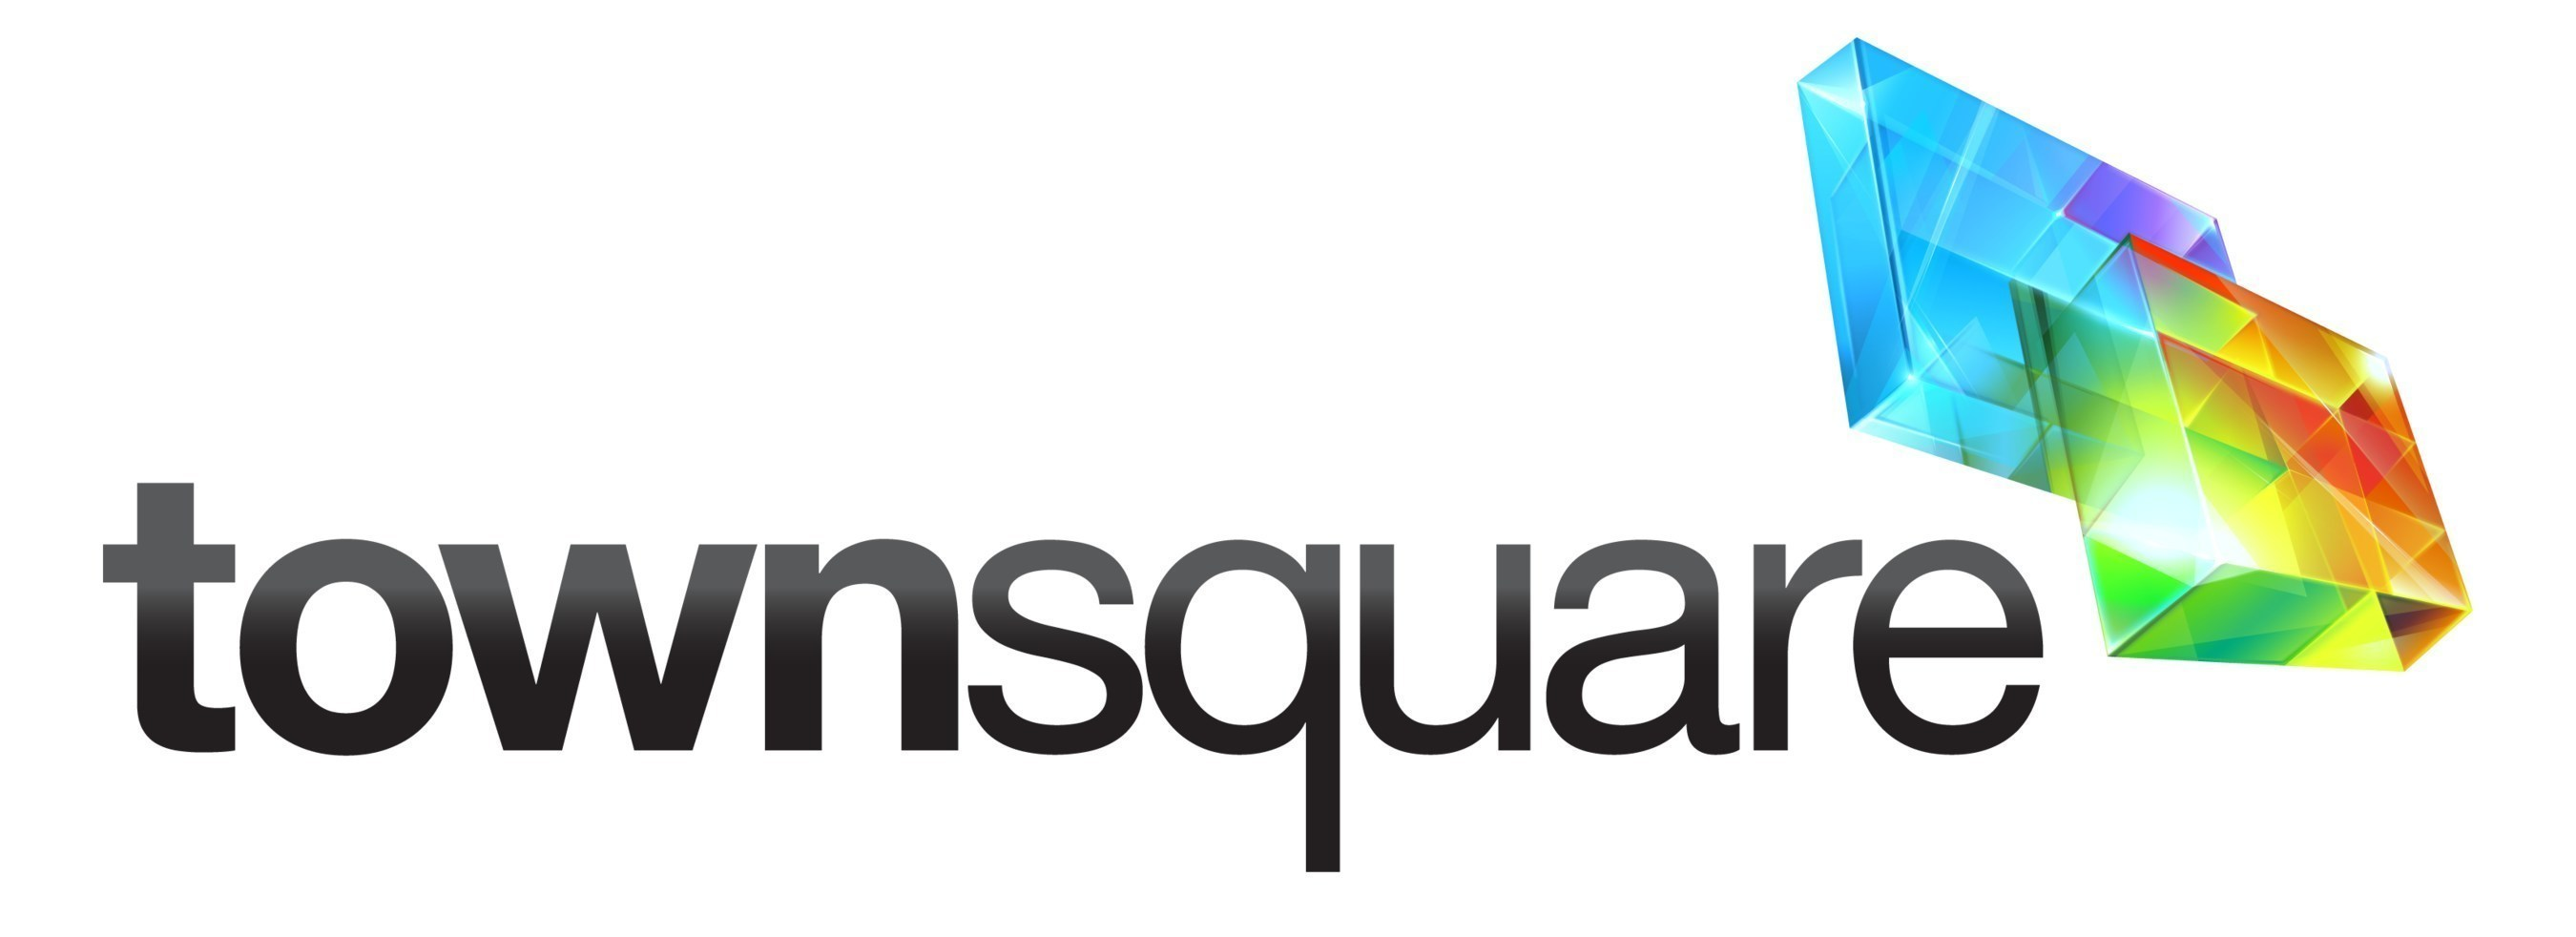 Townsquare Media, Inc.